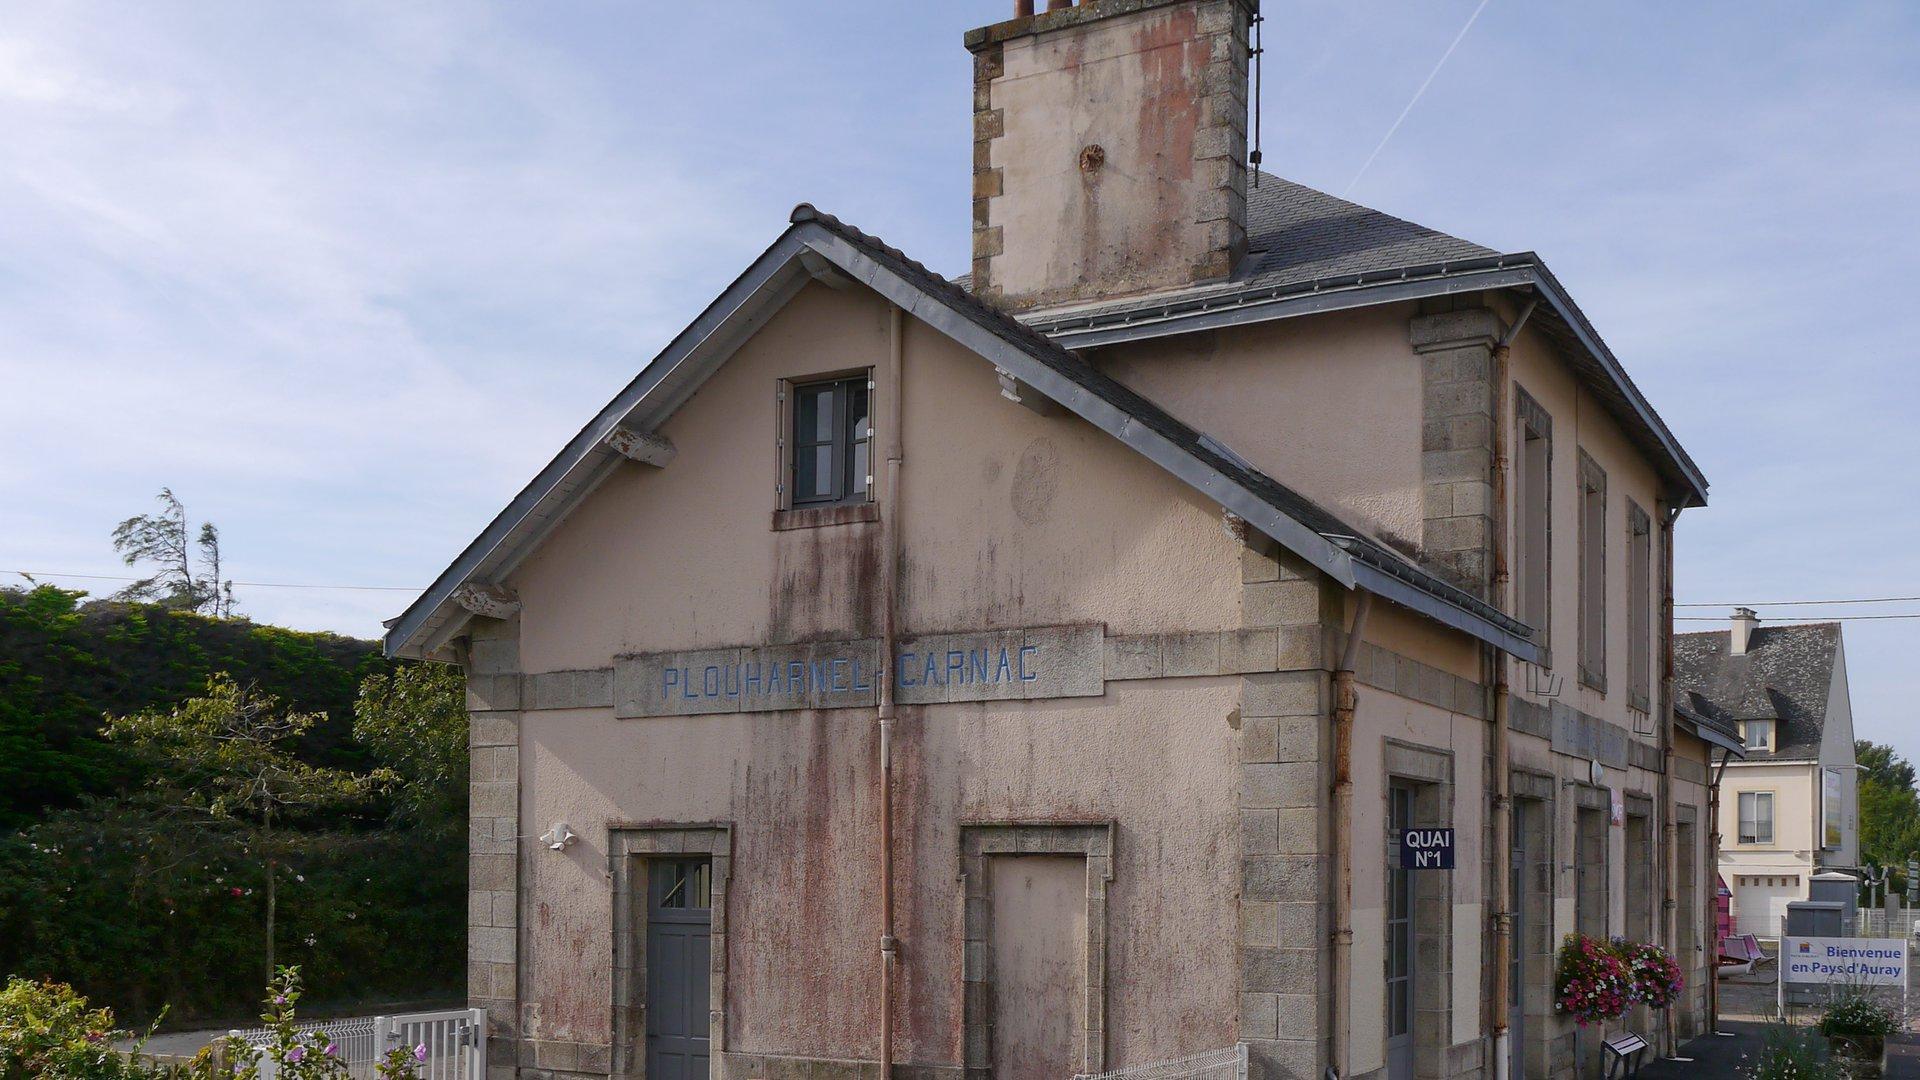 Plouharnel-Carnac